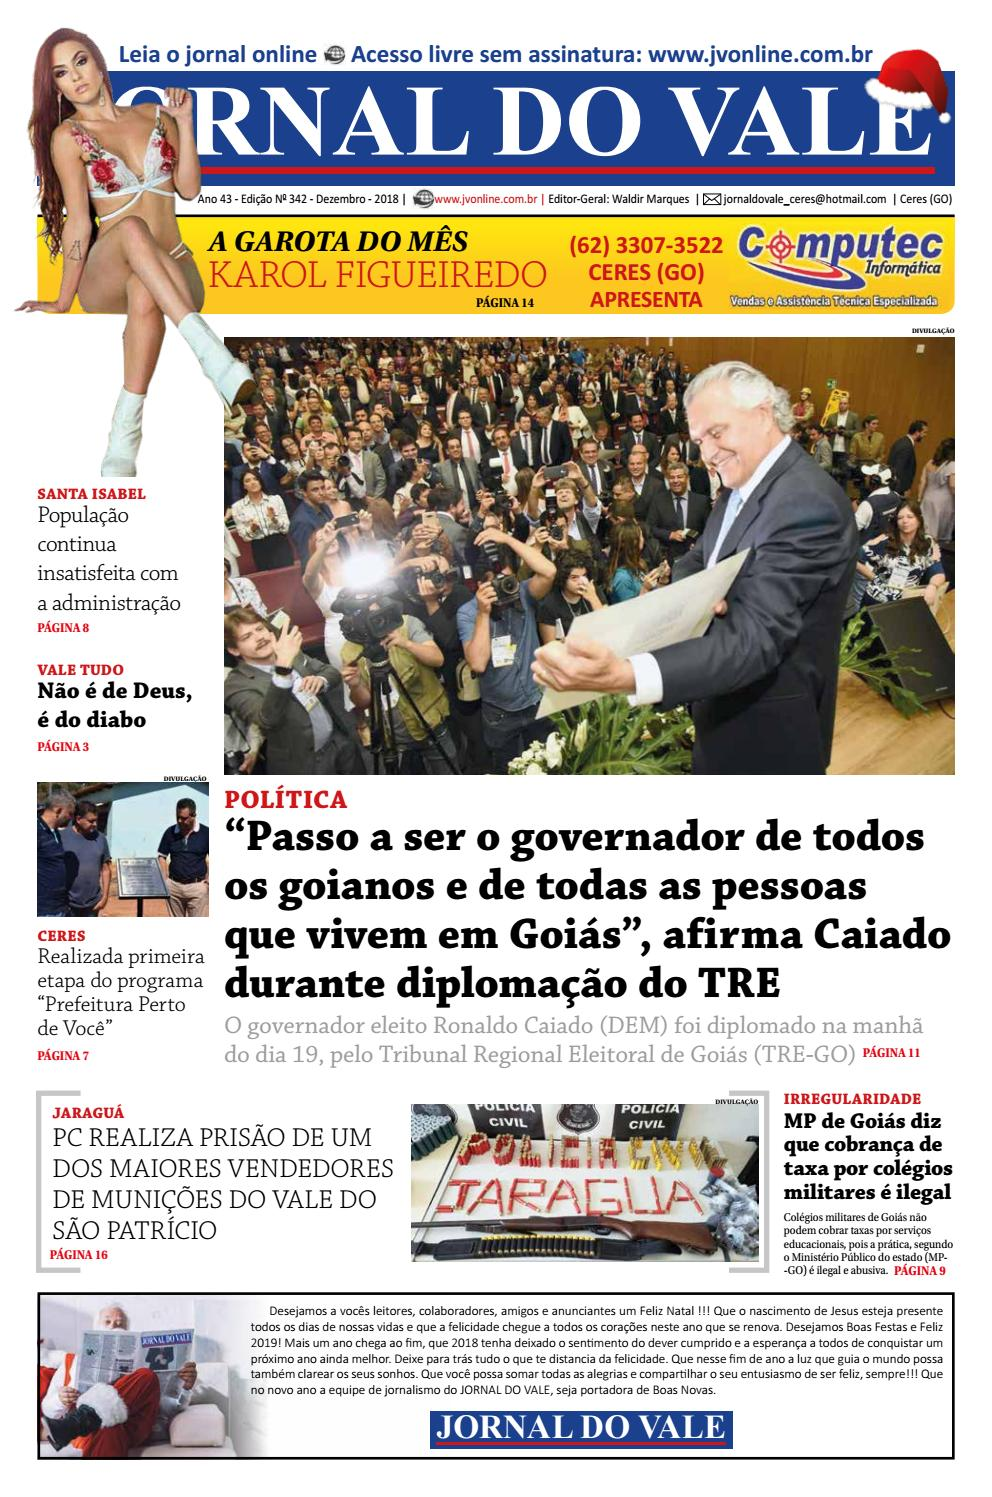 642dc700c Jornal do Vale - Edição 342 - Dezembro 2018 by jornal do vale - issuu